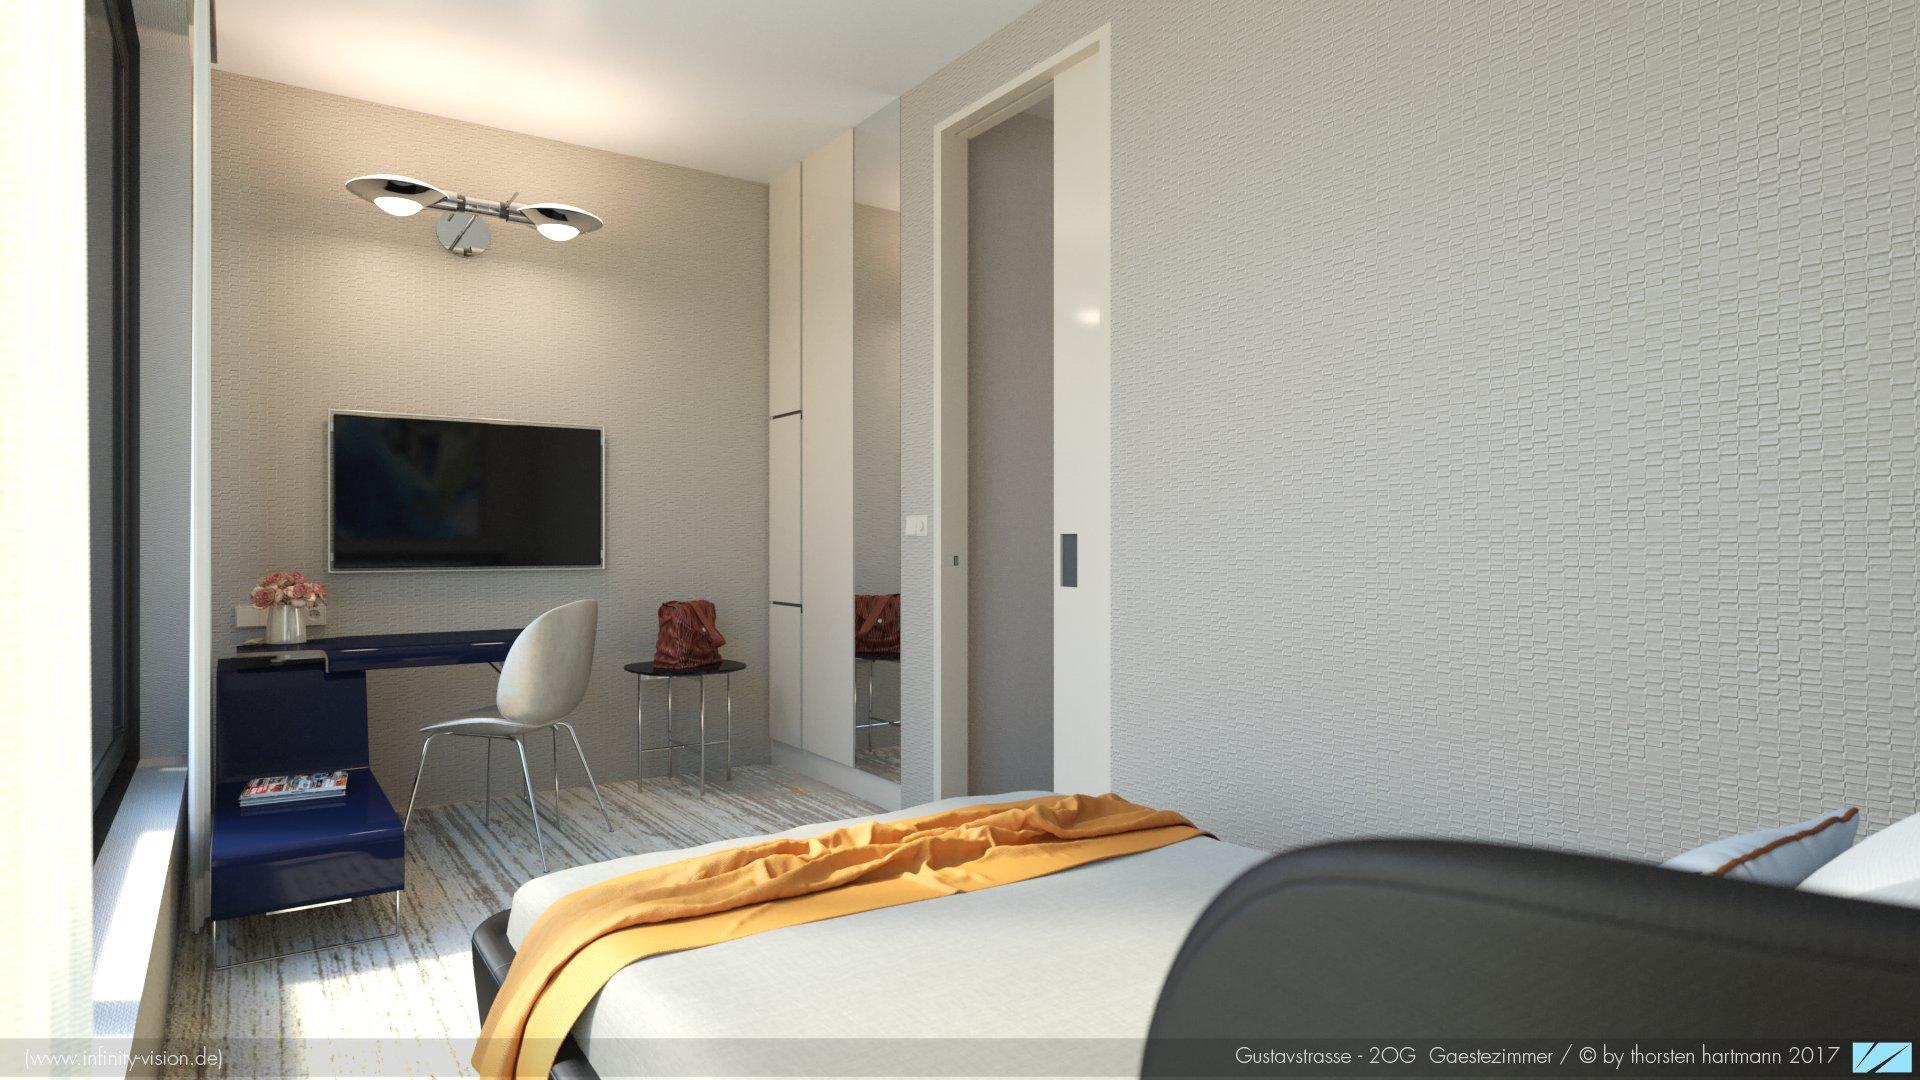 Gustavstrasse / Guest room